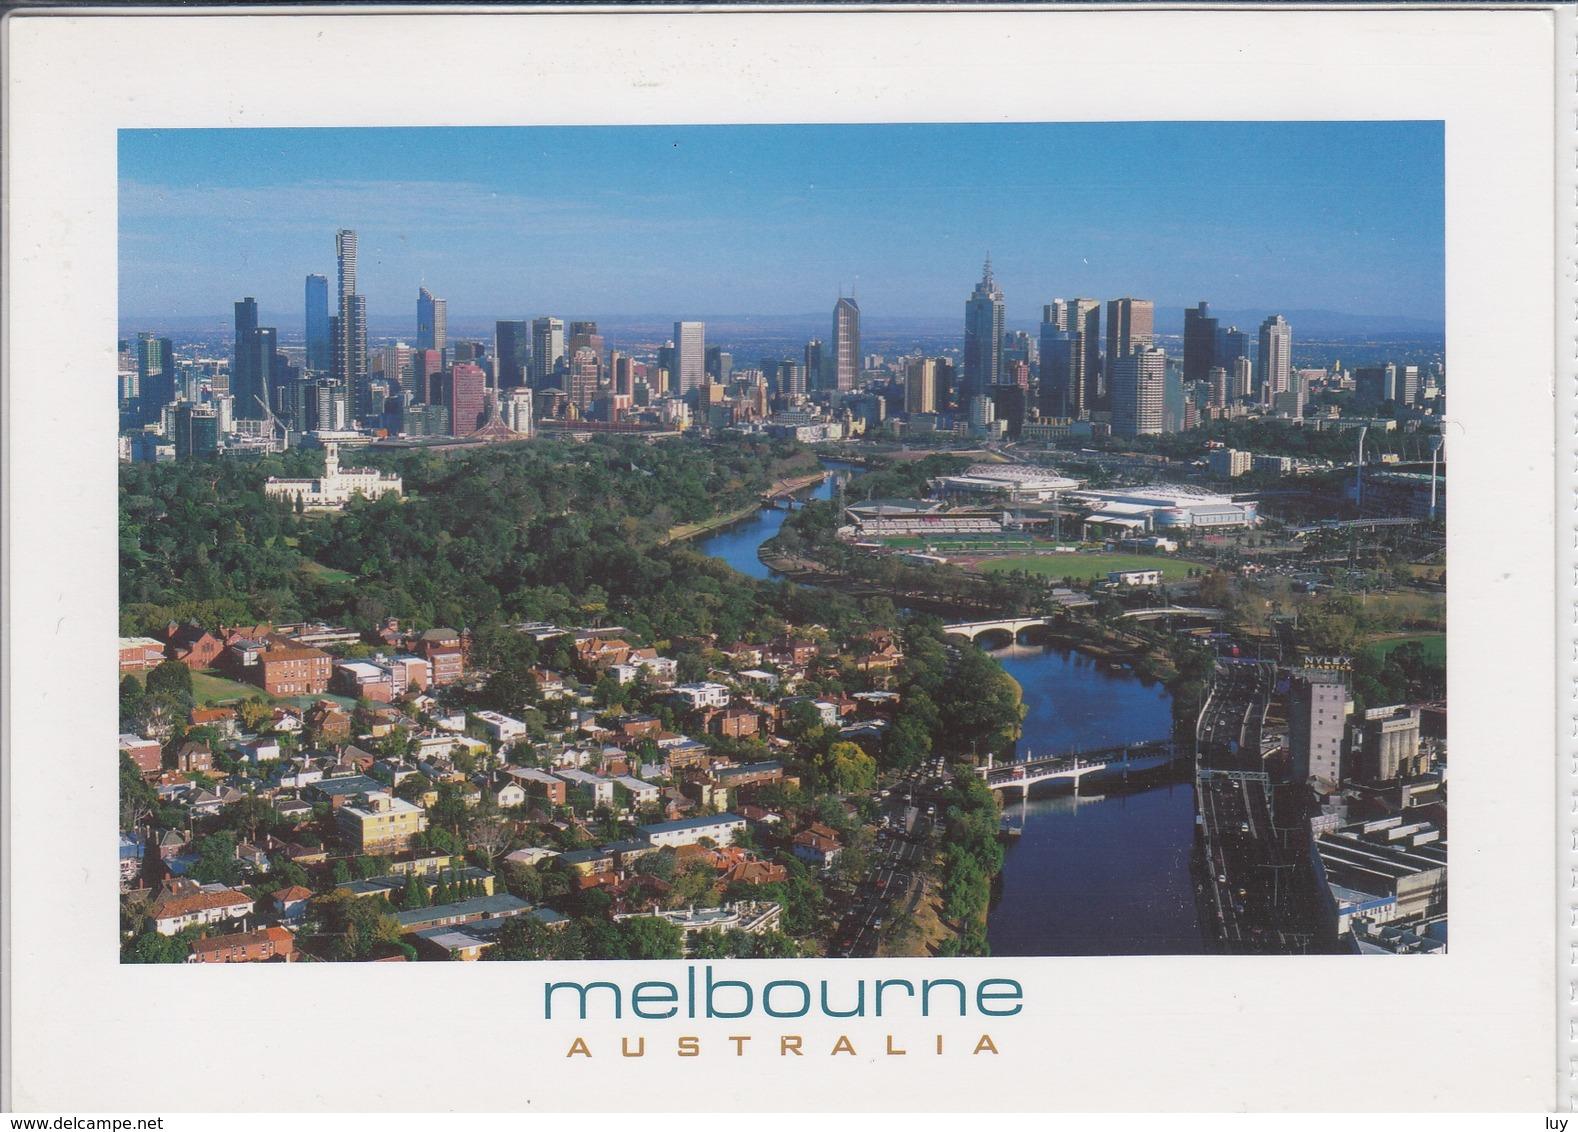 MELBOURNE AUSTRALIA  YARRA RIVER AND CITY SKYLINE  USED NICE STAMP - Melbourne